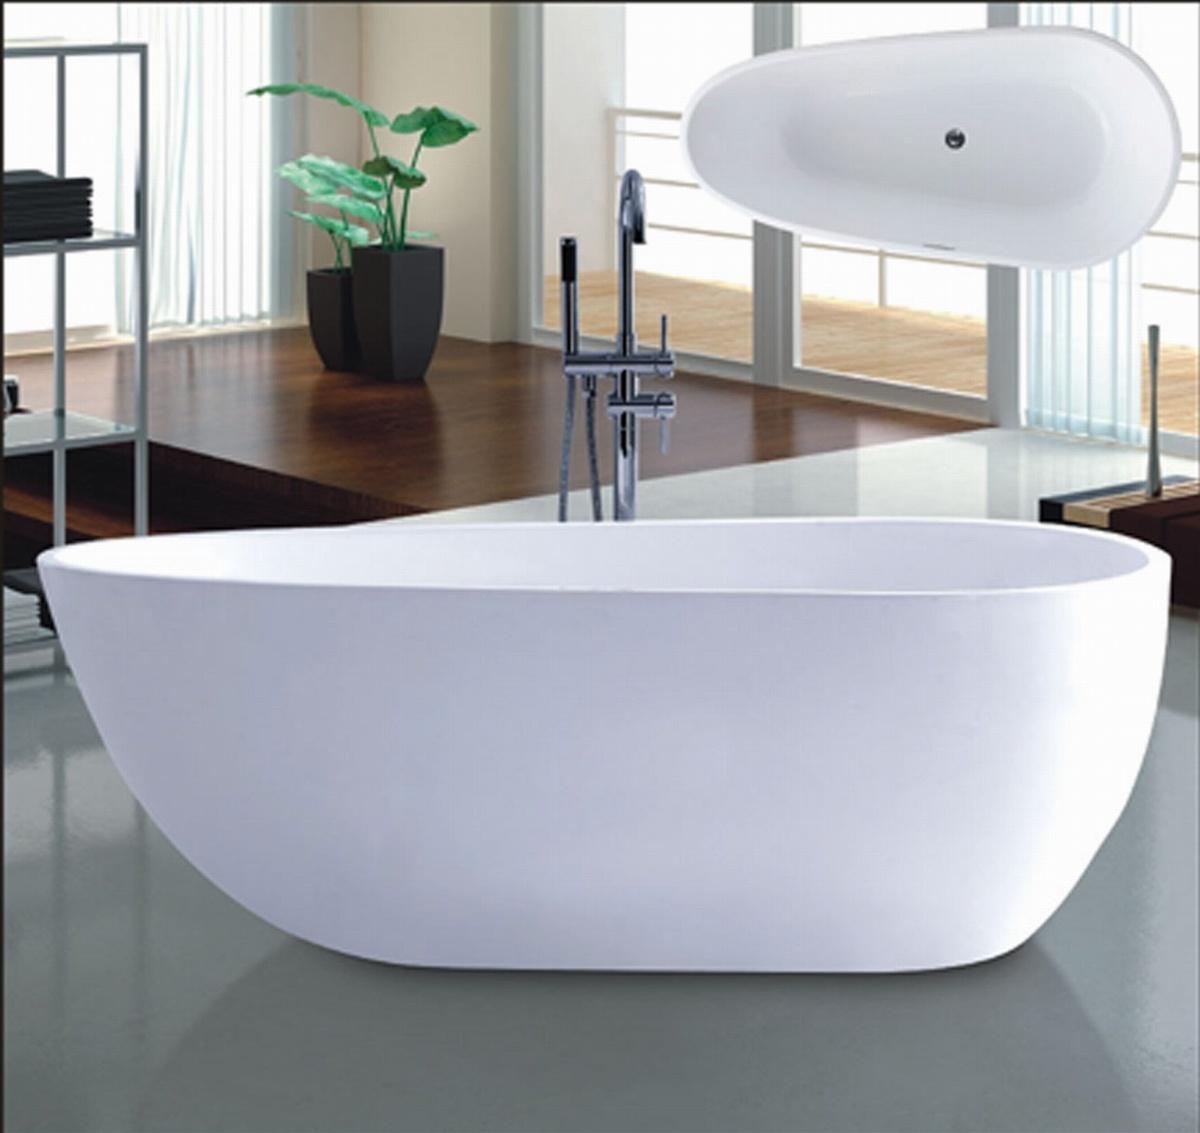 New 1700mm Ellipse Freestanding Bathtub SPA for Villa (AT-6181)